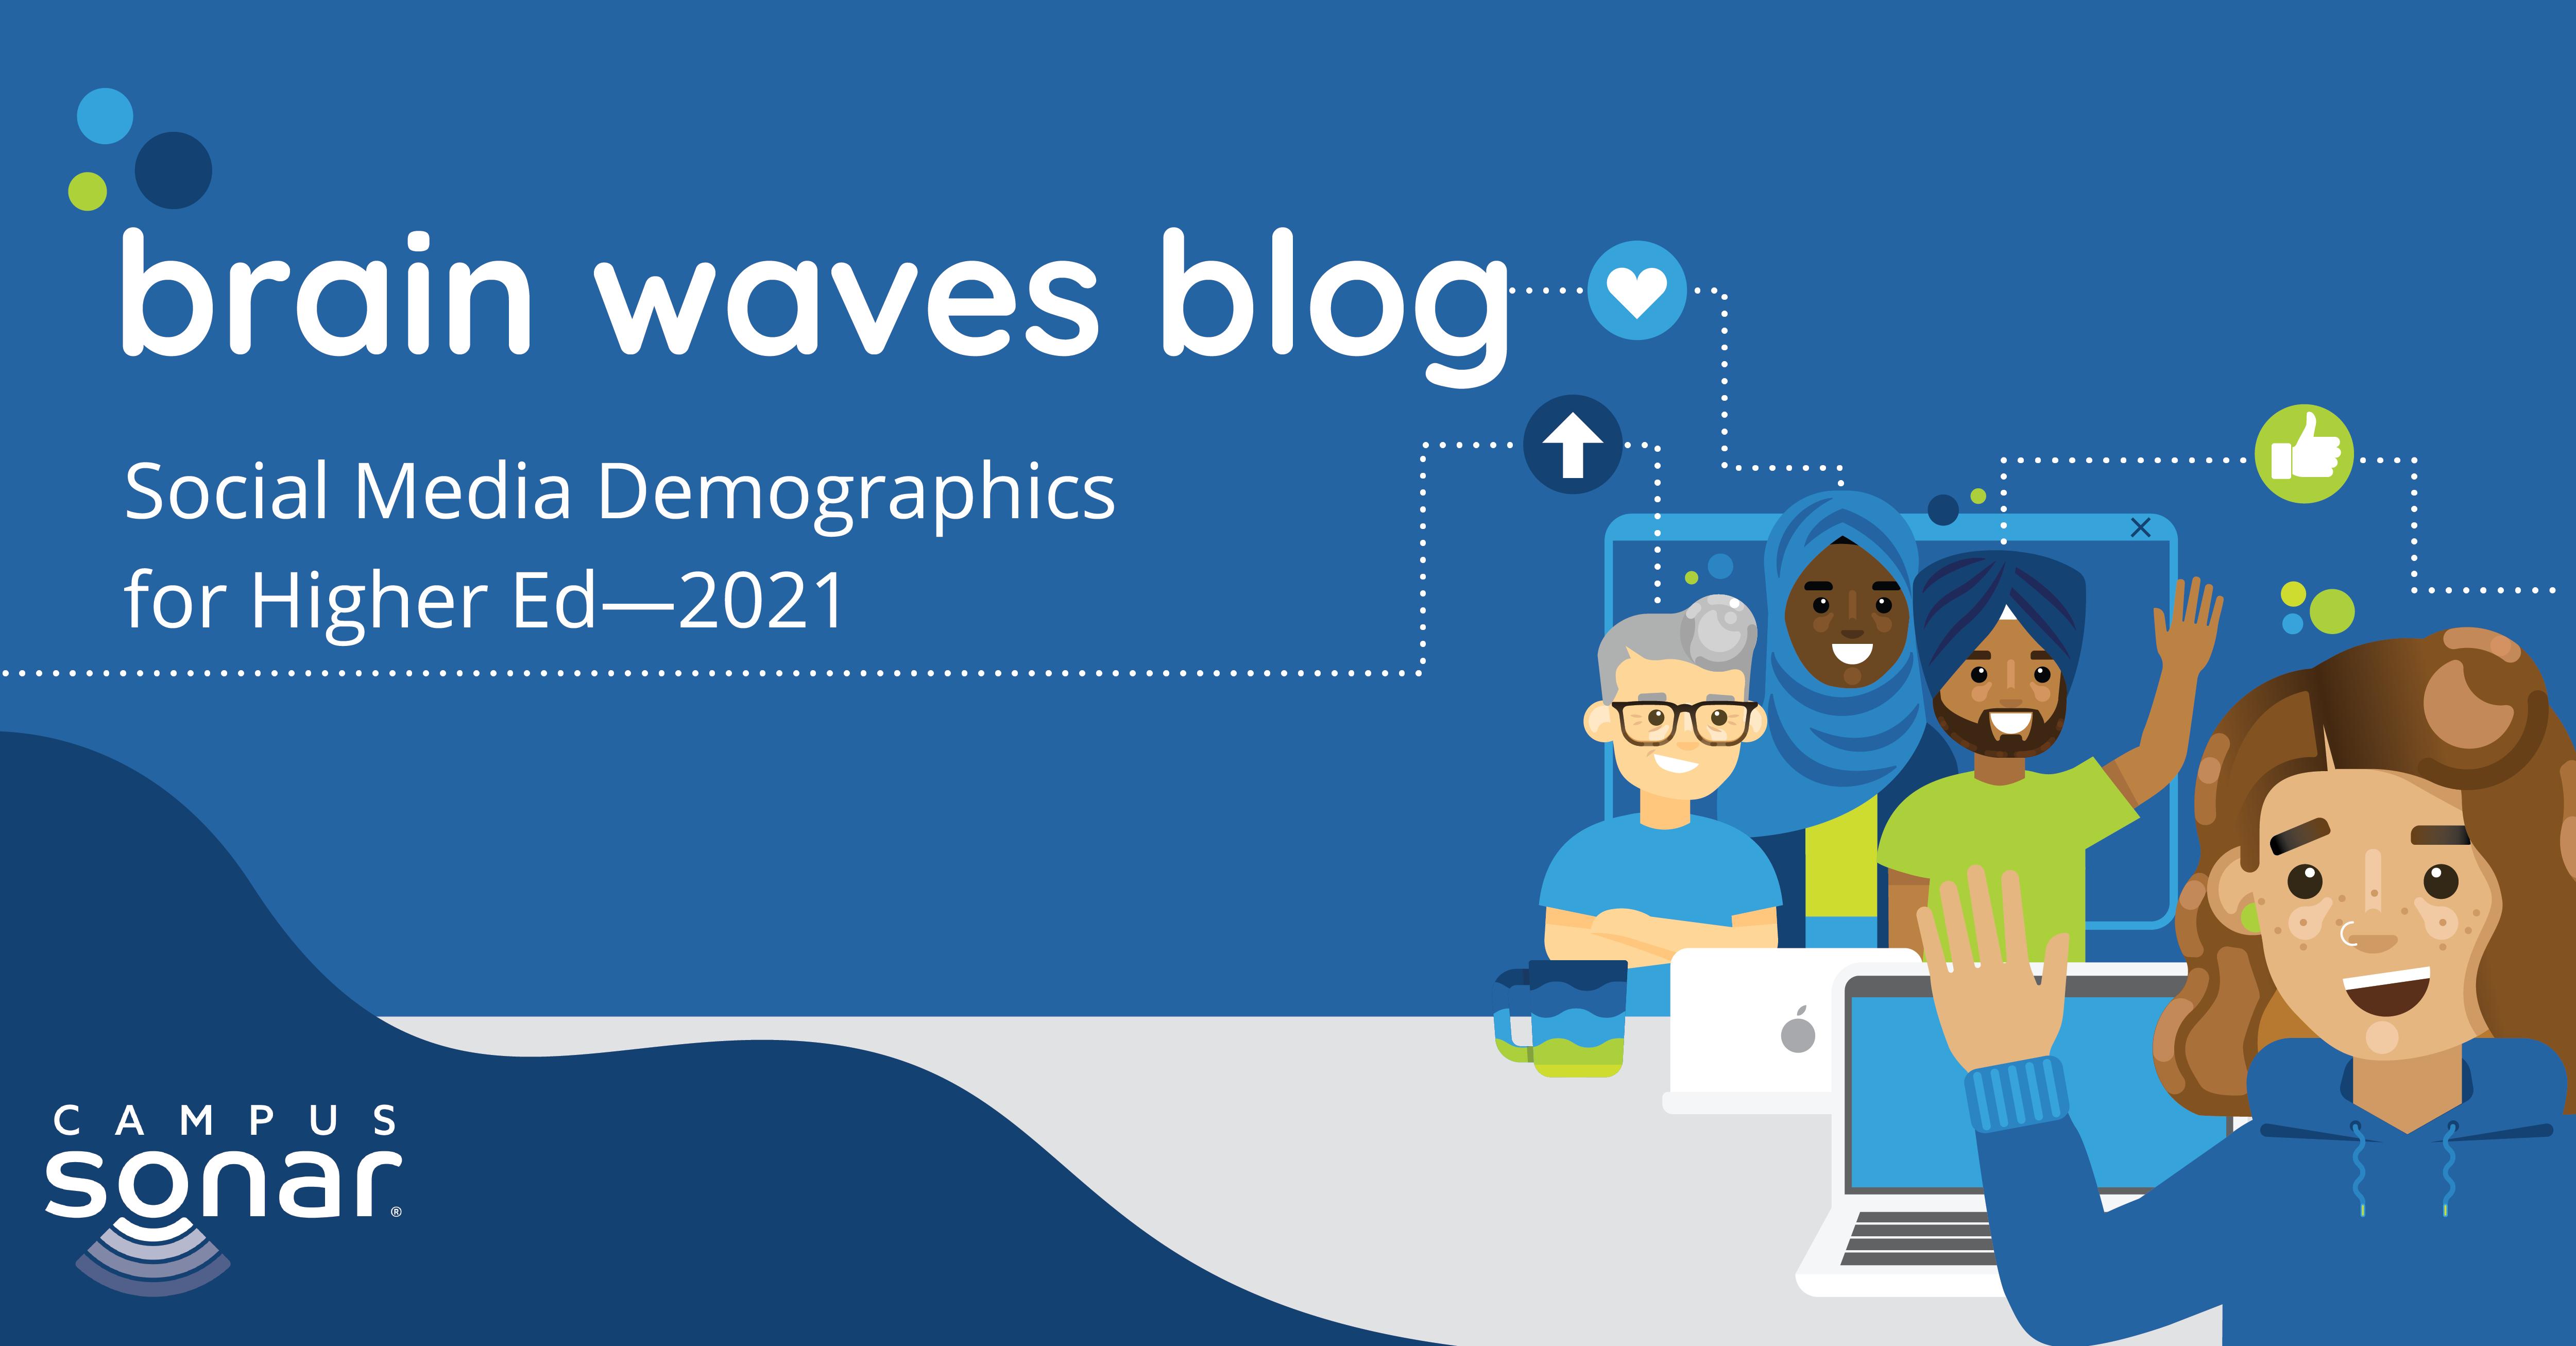 Brain Waves Blog: Social Media Demographics for Higher Ed - 2021